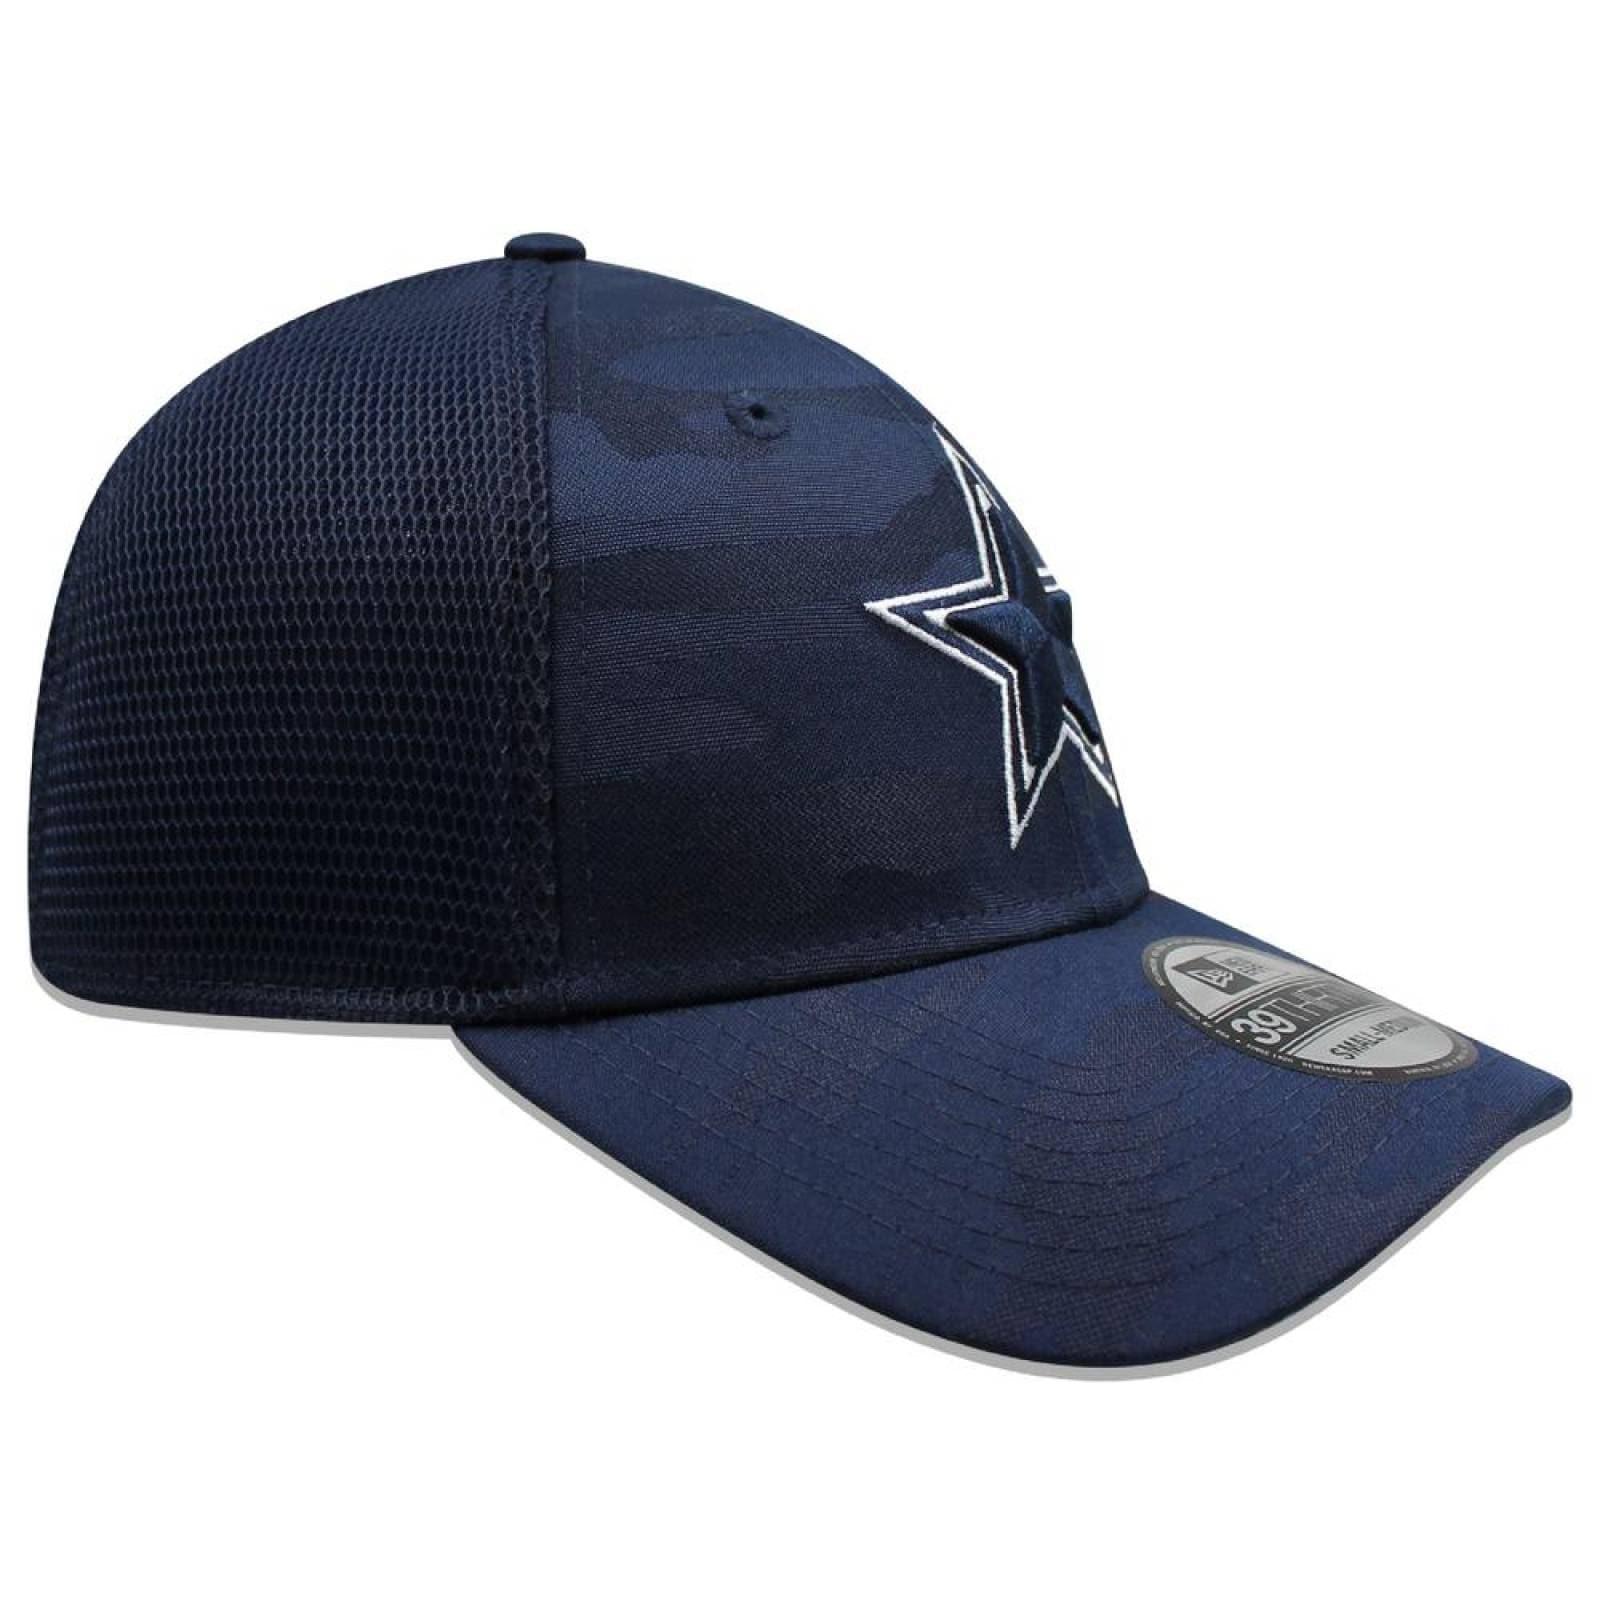 Gorra New Era 39 Thirty NFL Cowboys Camo Front Azul Marino